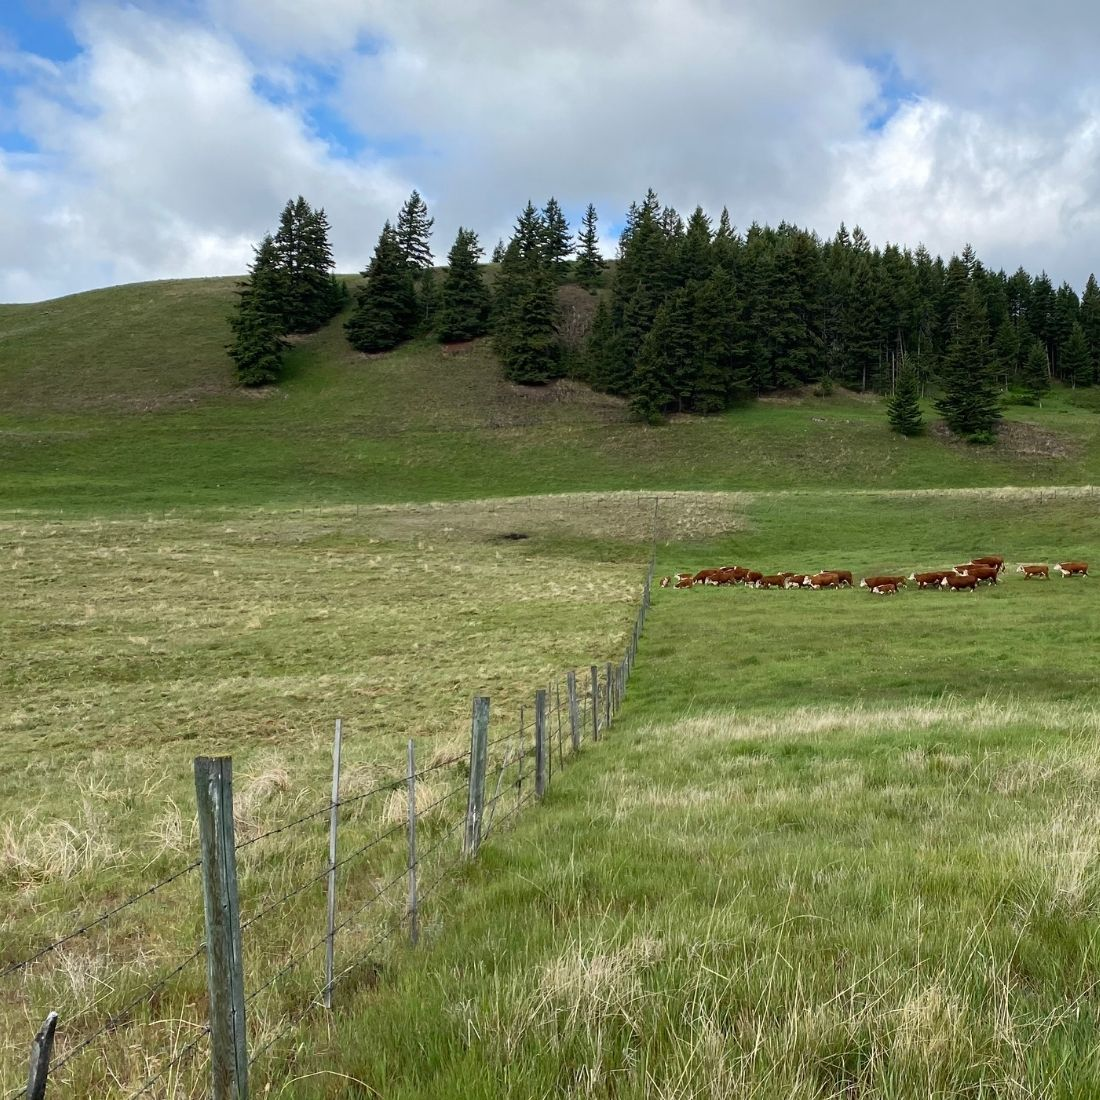 Difference on pastures between ungrazed vs grazed